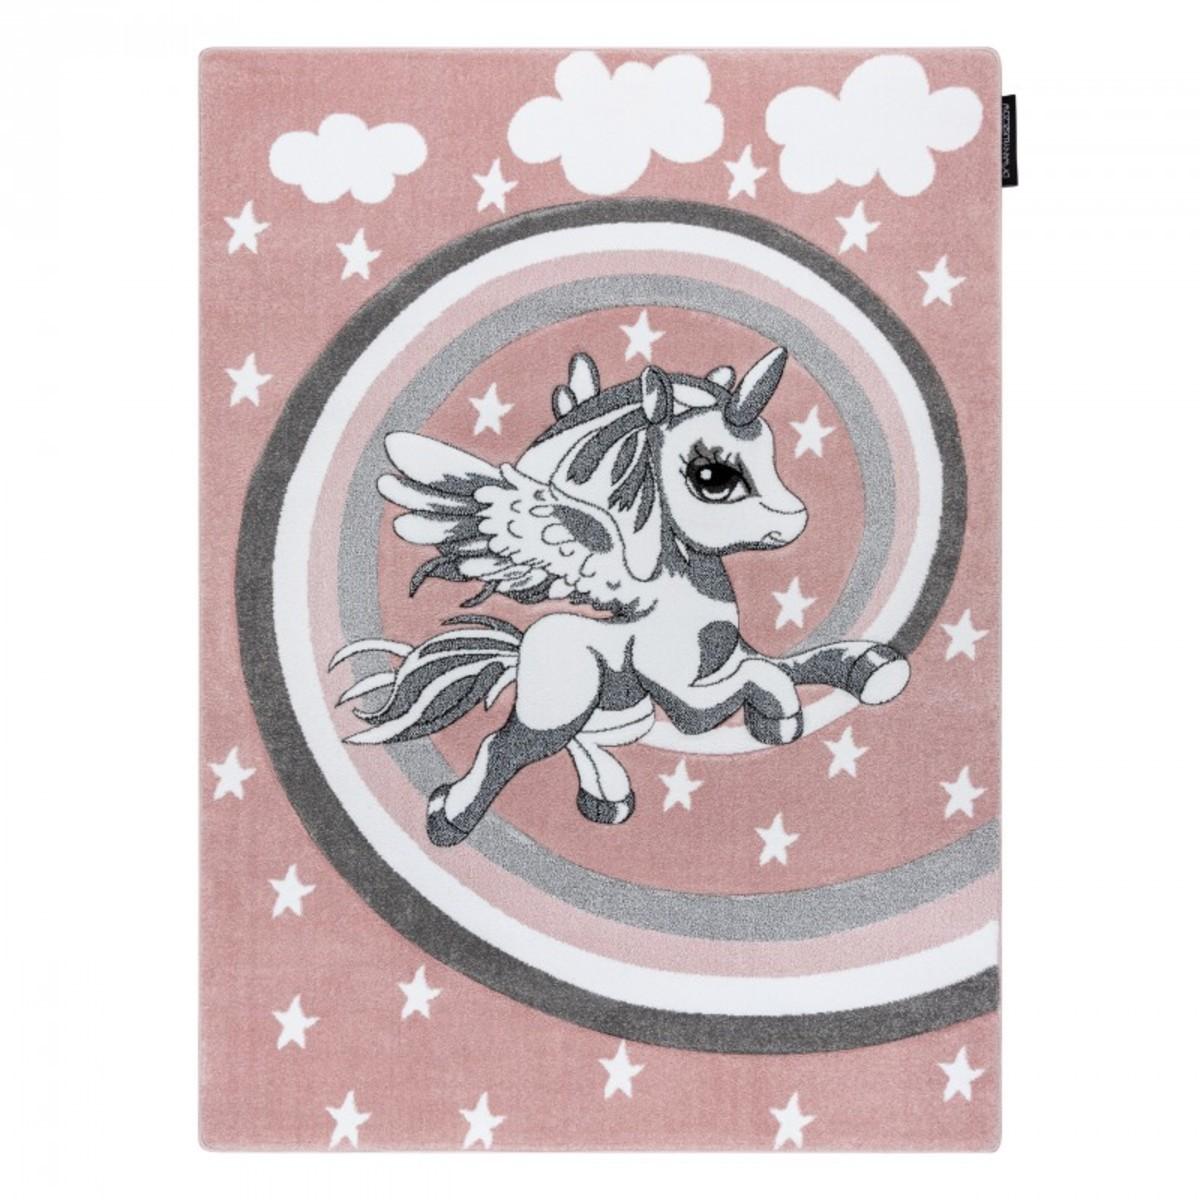 Detský koberec PETIT - Jednorožec - ružový Unicorn rug - pink 120 x 170 cm